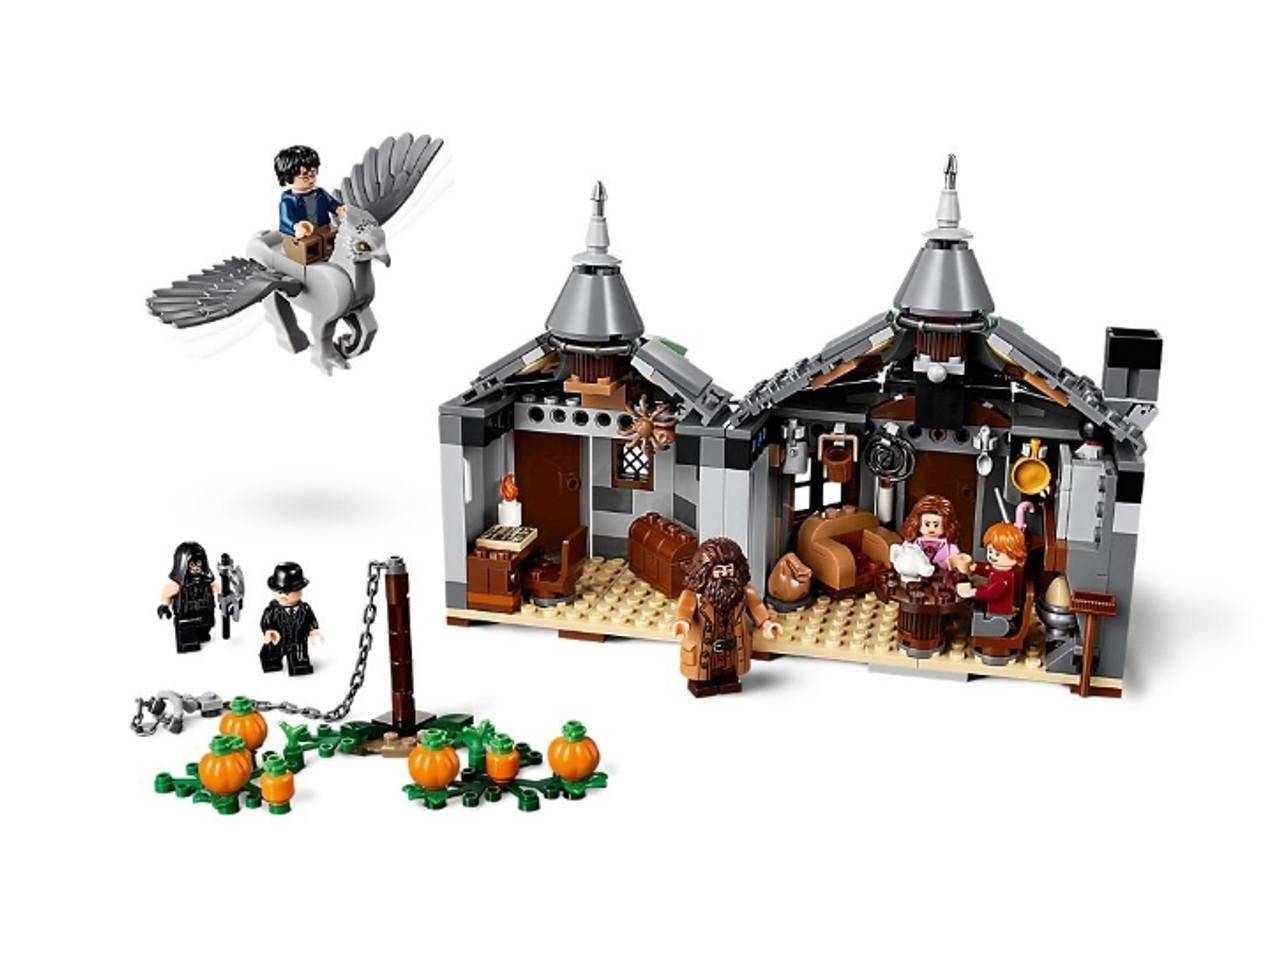 Rescue75947 Hut Lego Harry Buckbeak's Potter Hagrid's FKcJu3Tl1